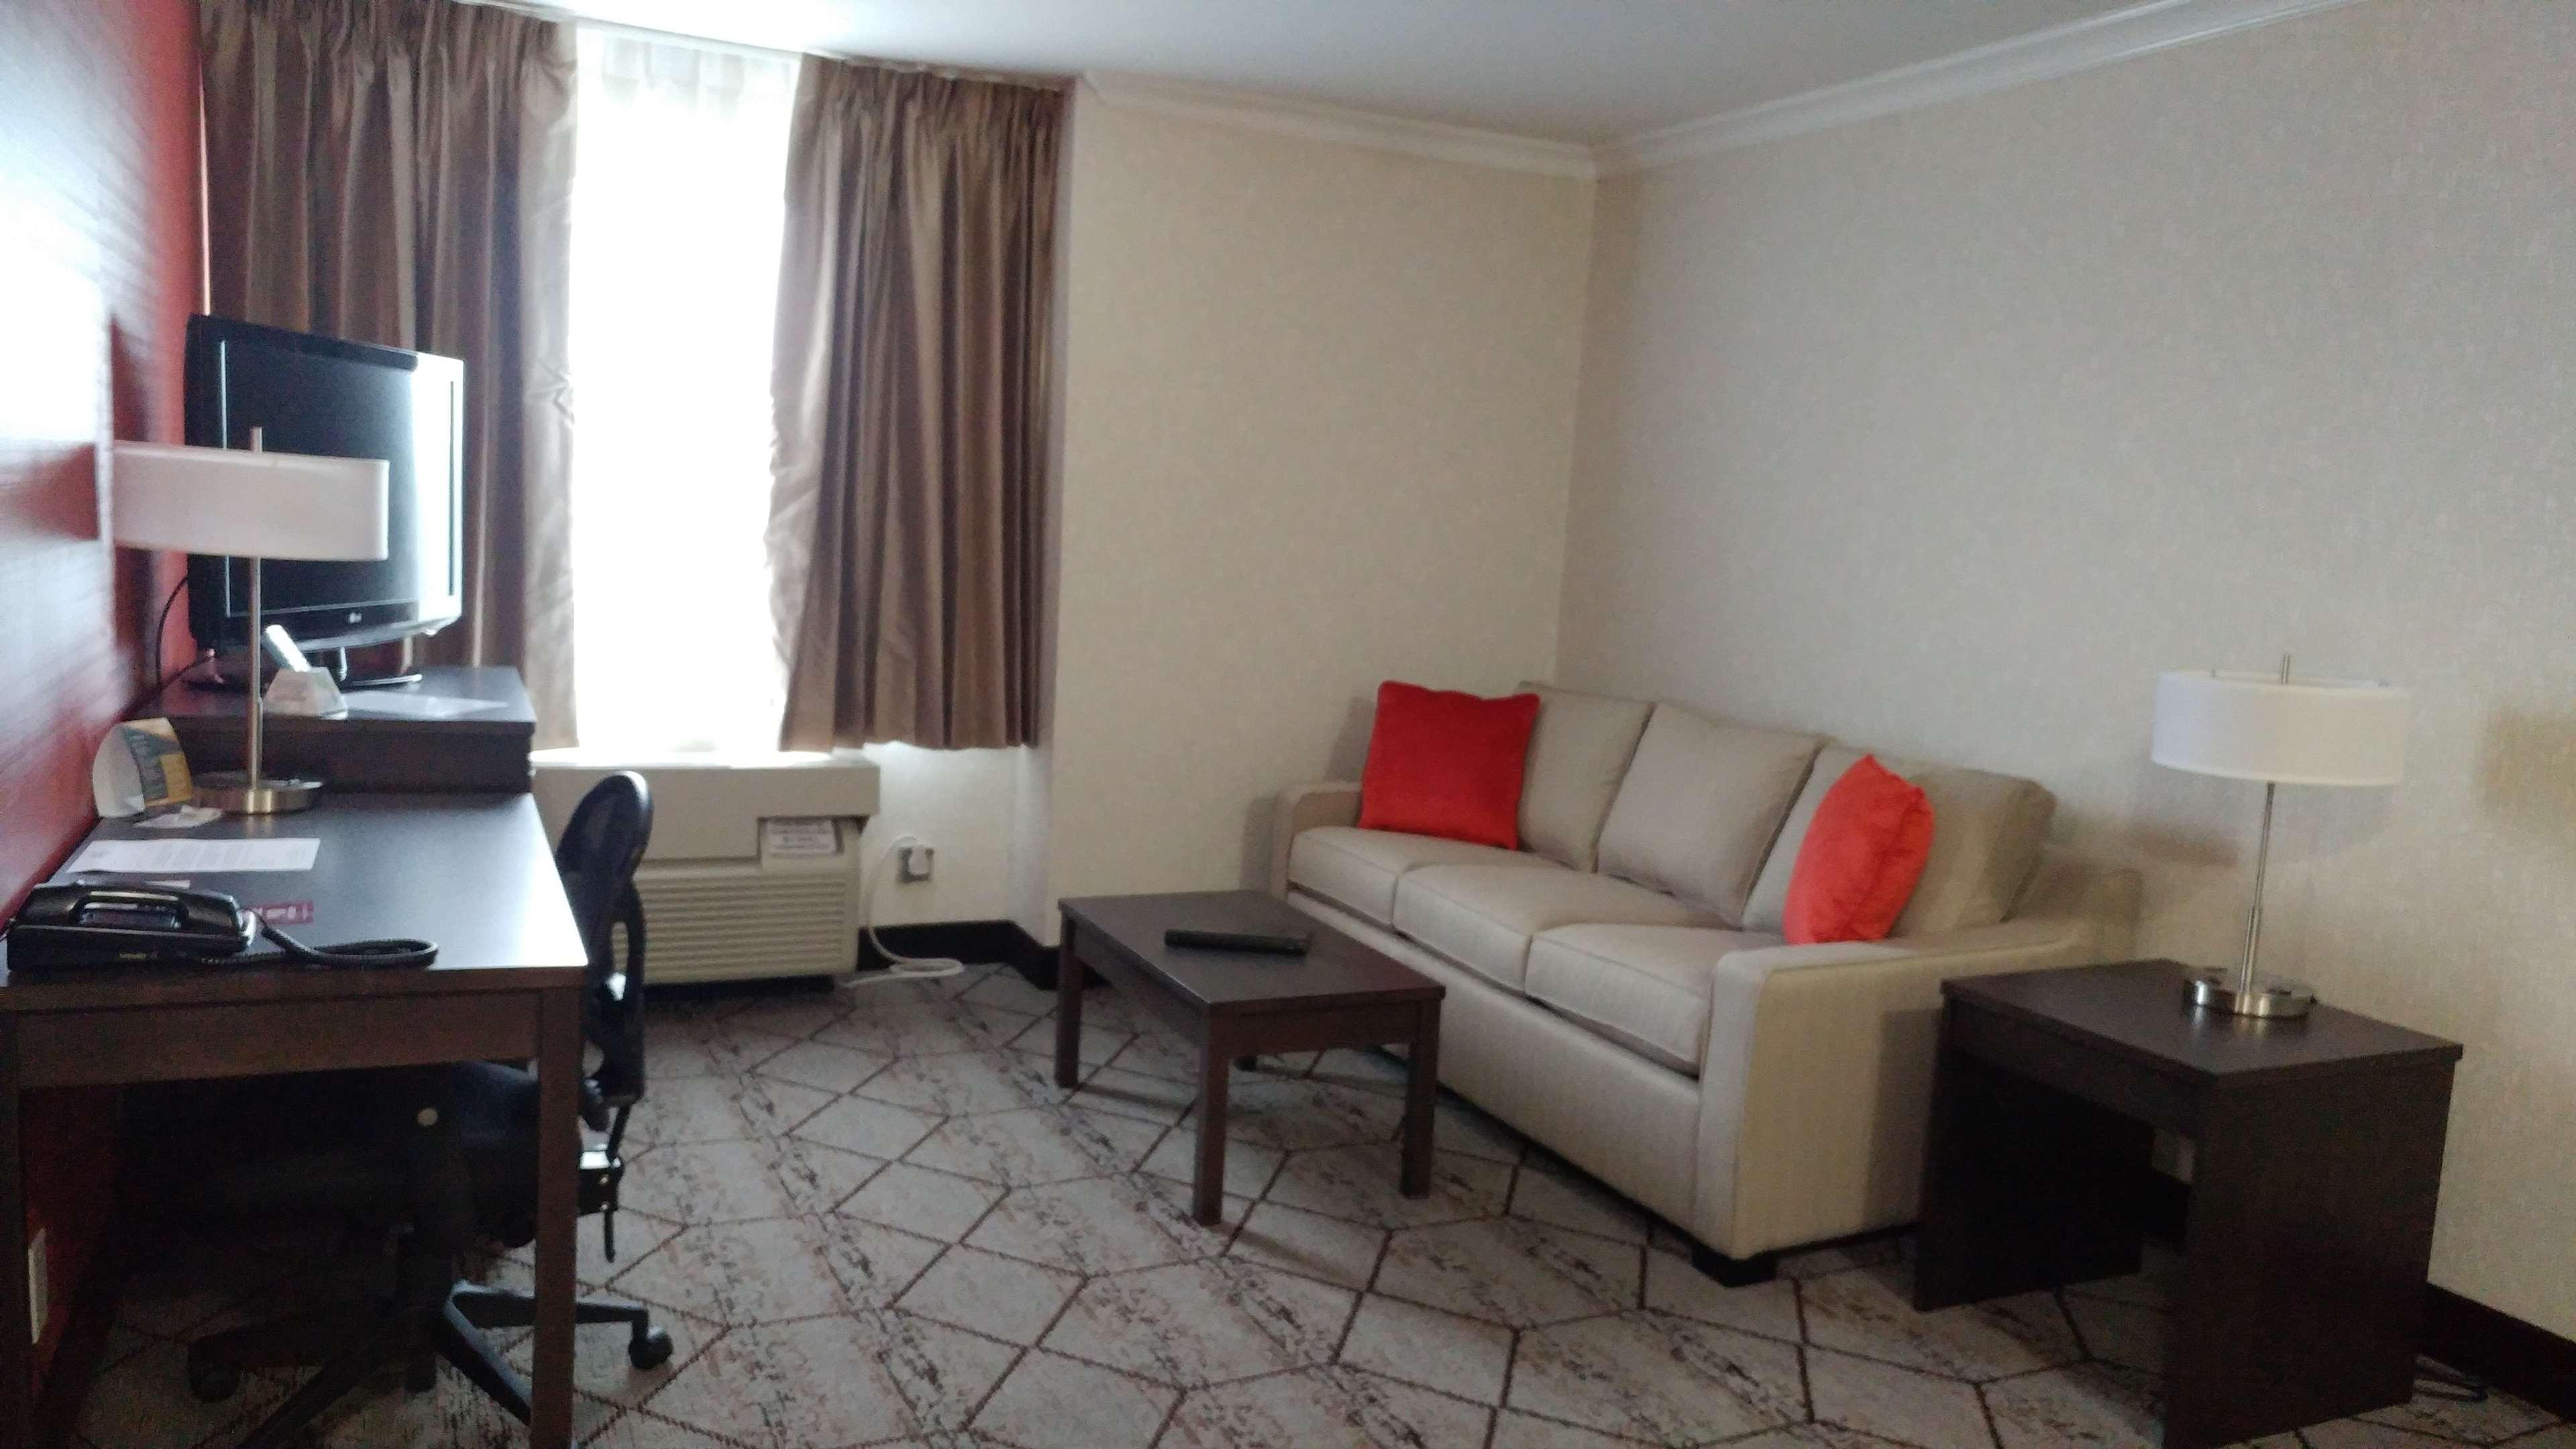 Best Western Plus Rose City Suites in Welland: Guest Room